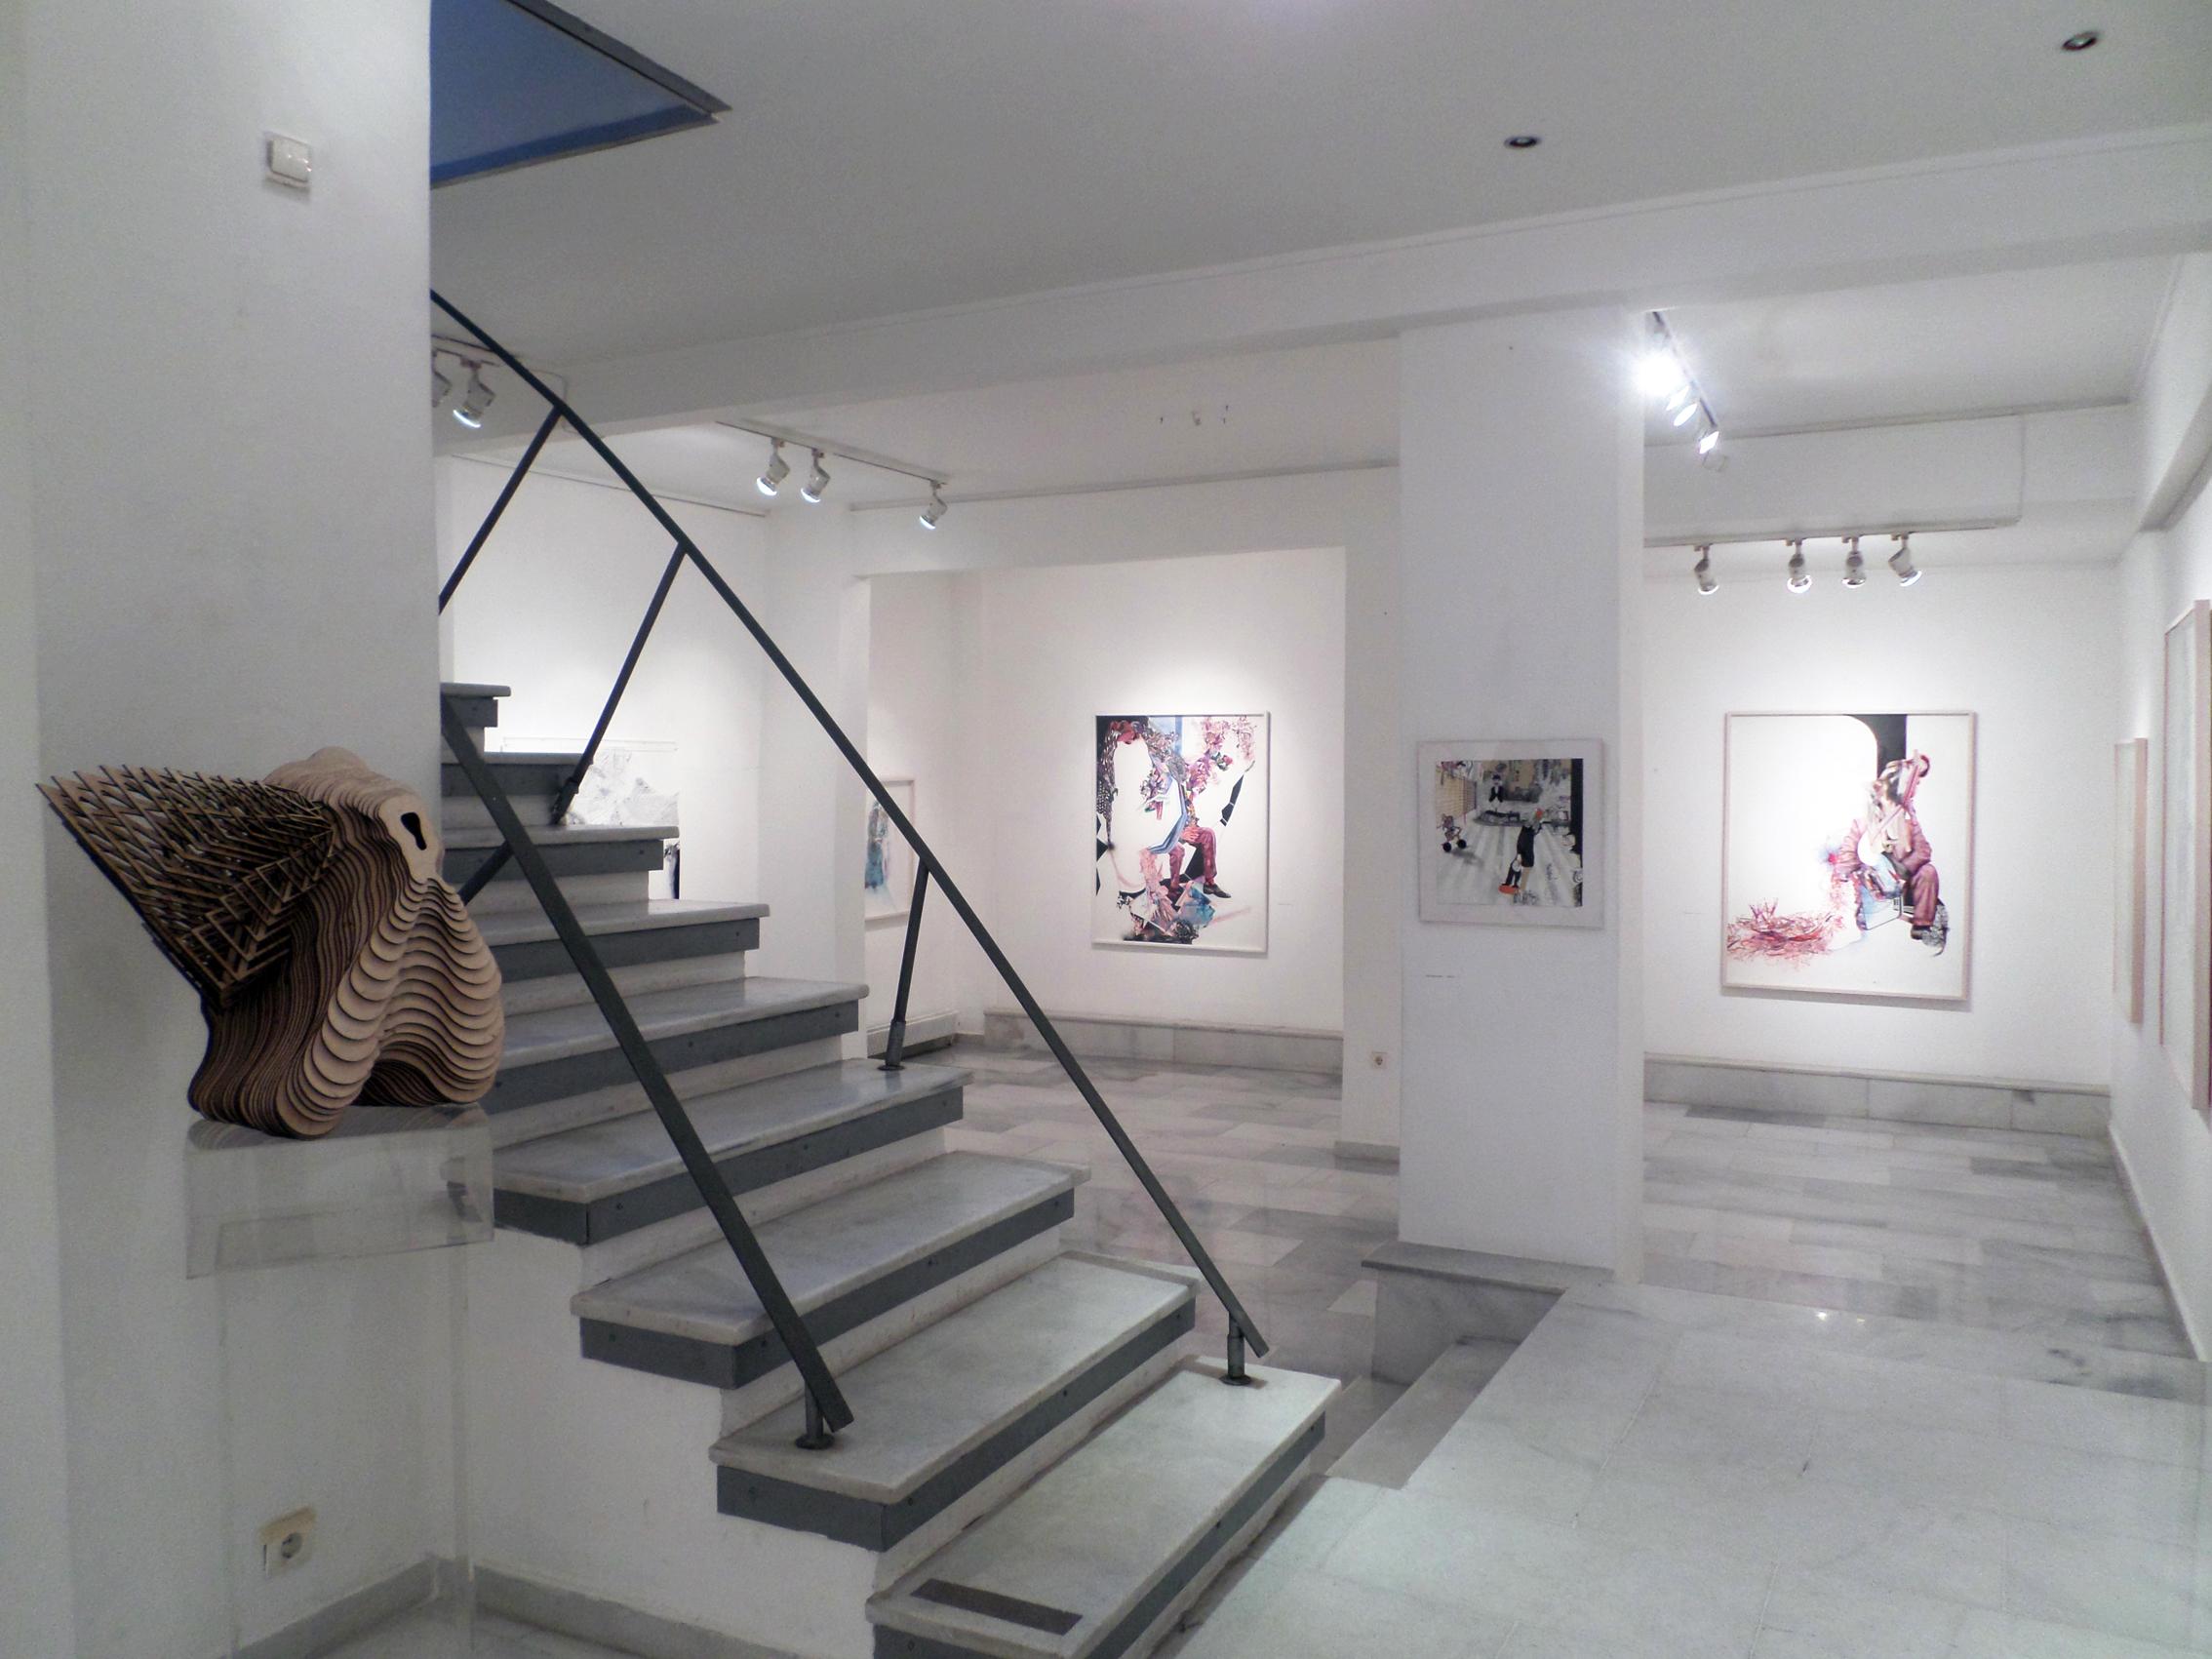 Zina Athanassiadou gallery exhibition view1 (1).jpg